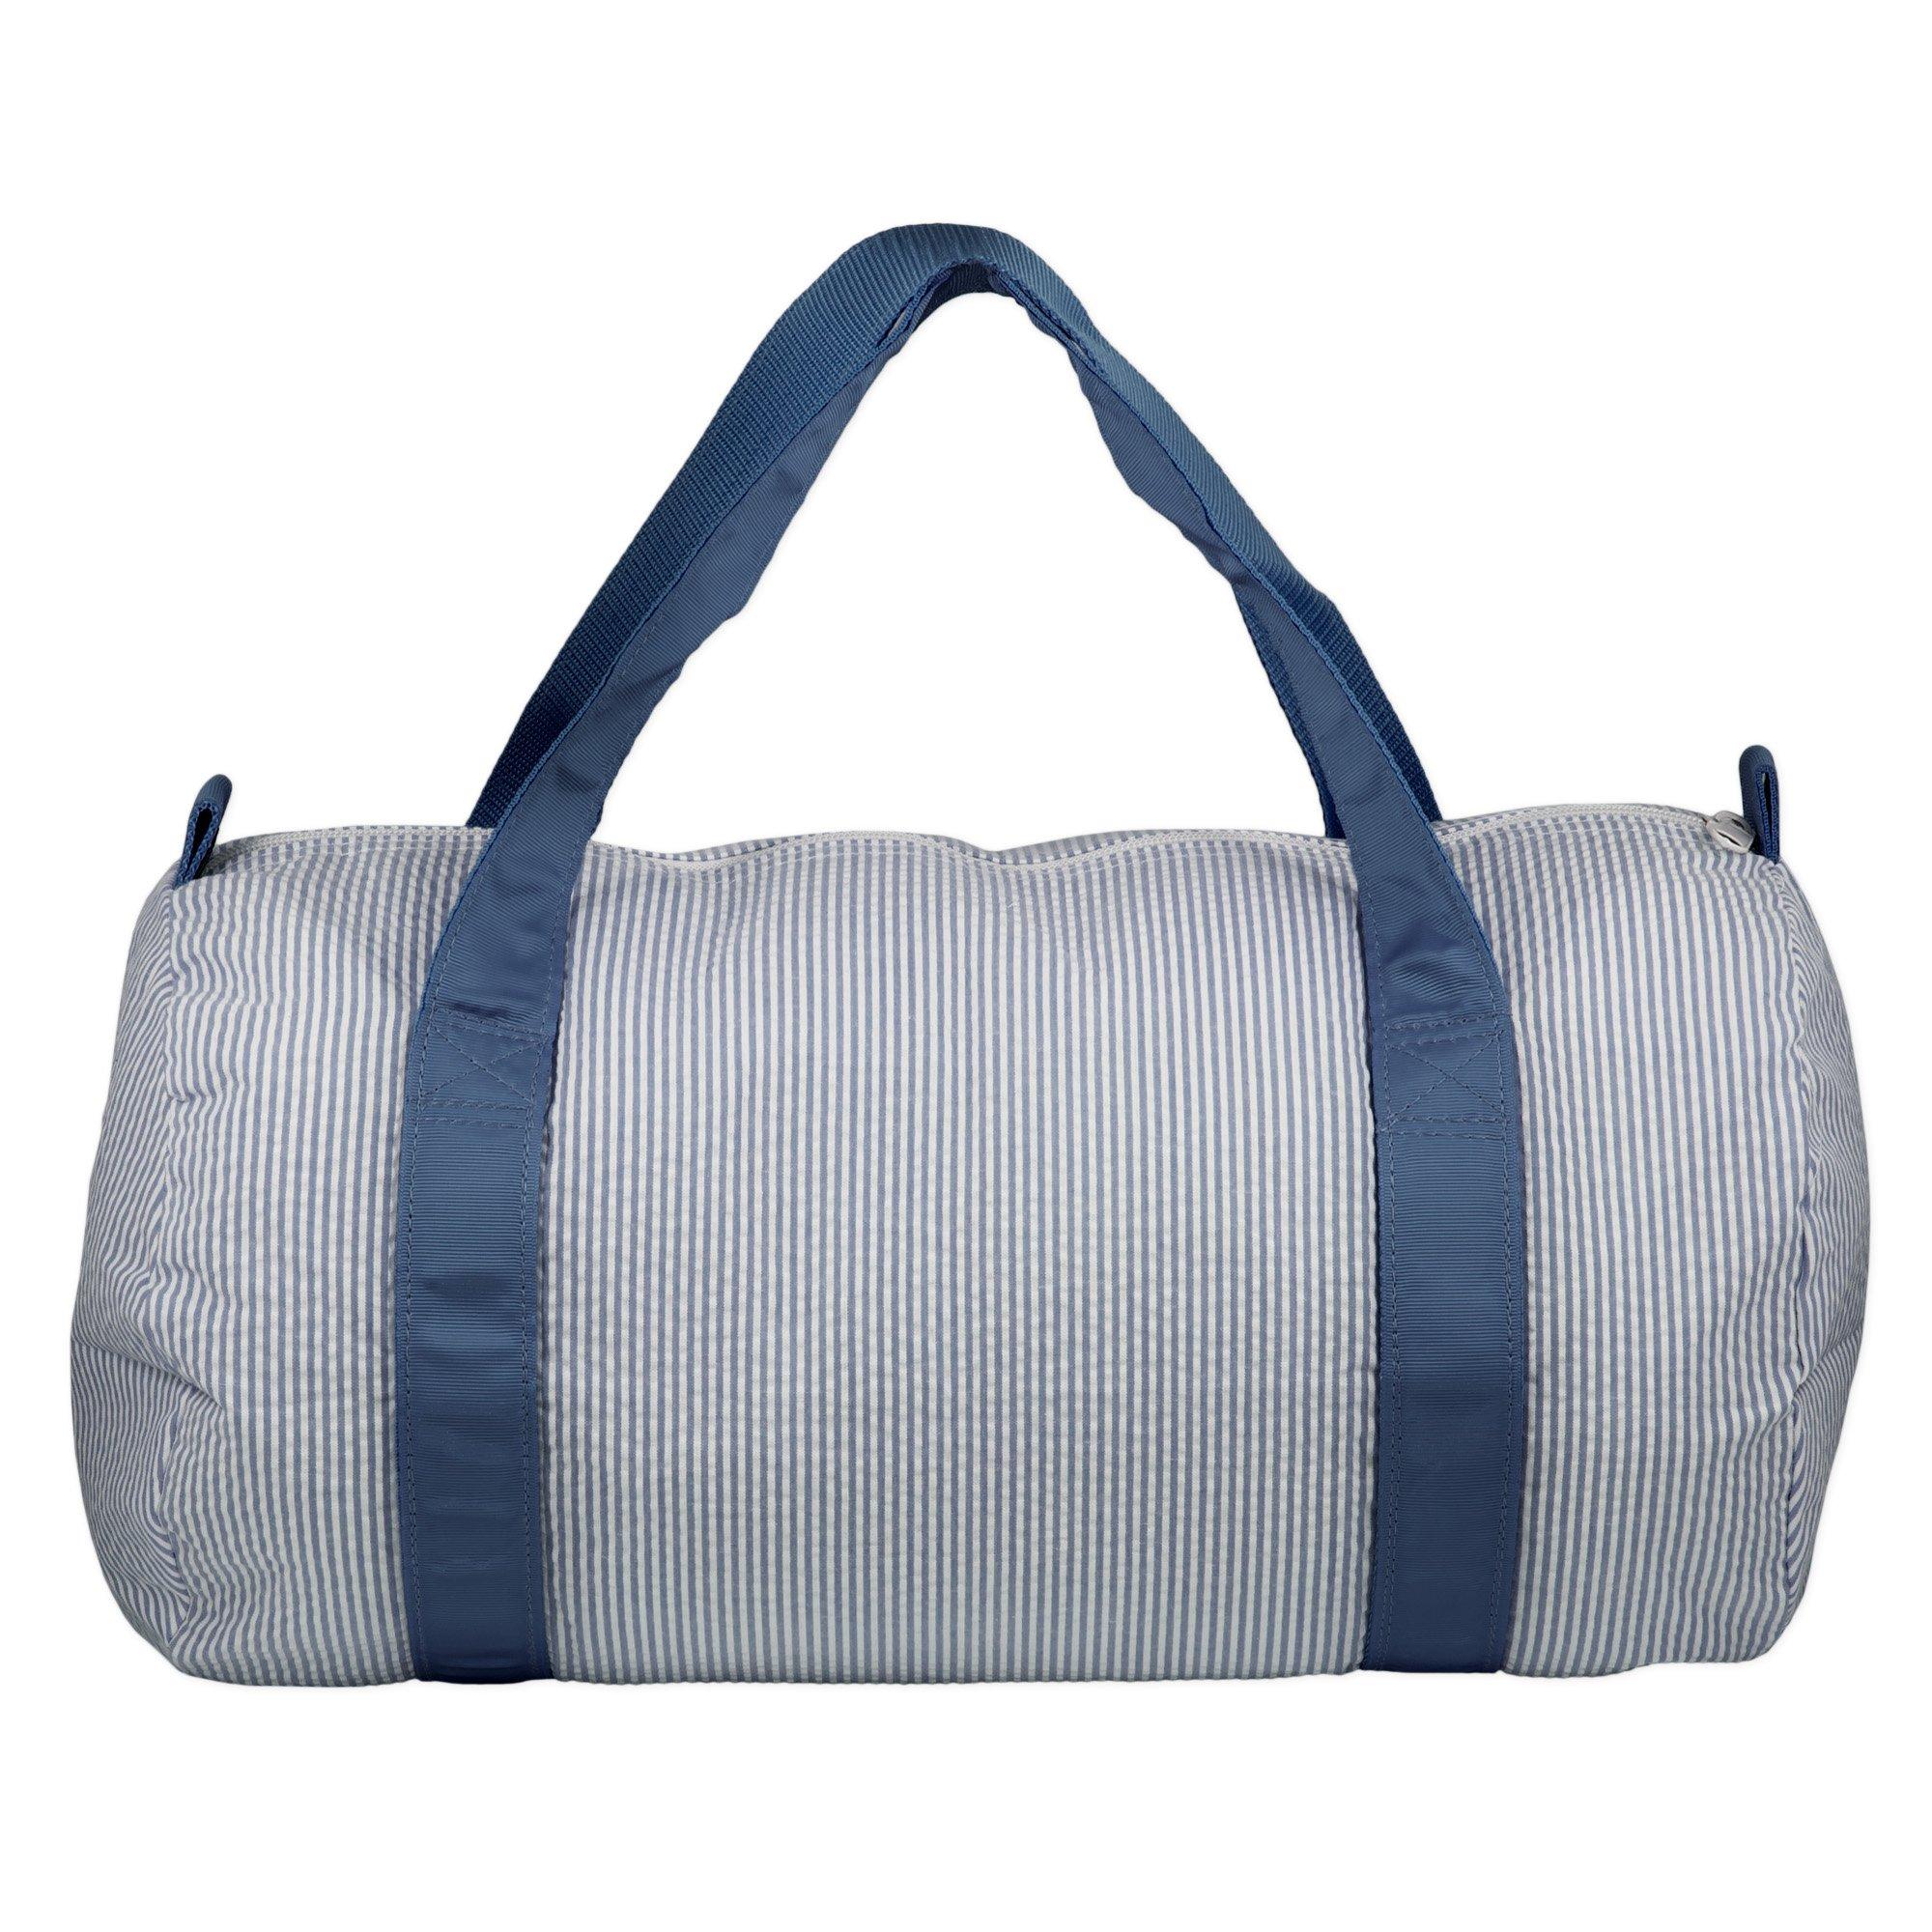 Cotton Medium Round Overnight Gym Duffel Bag - Navy Stripes